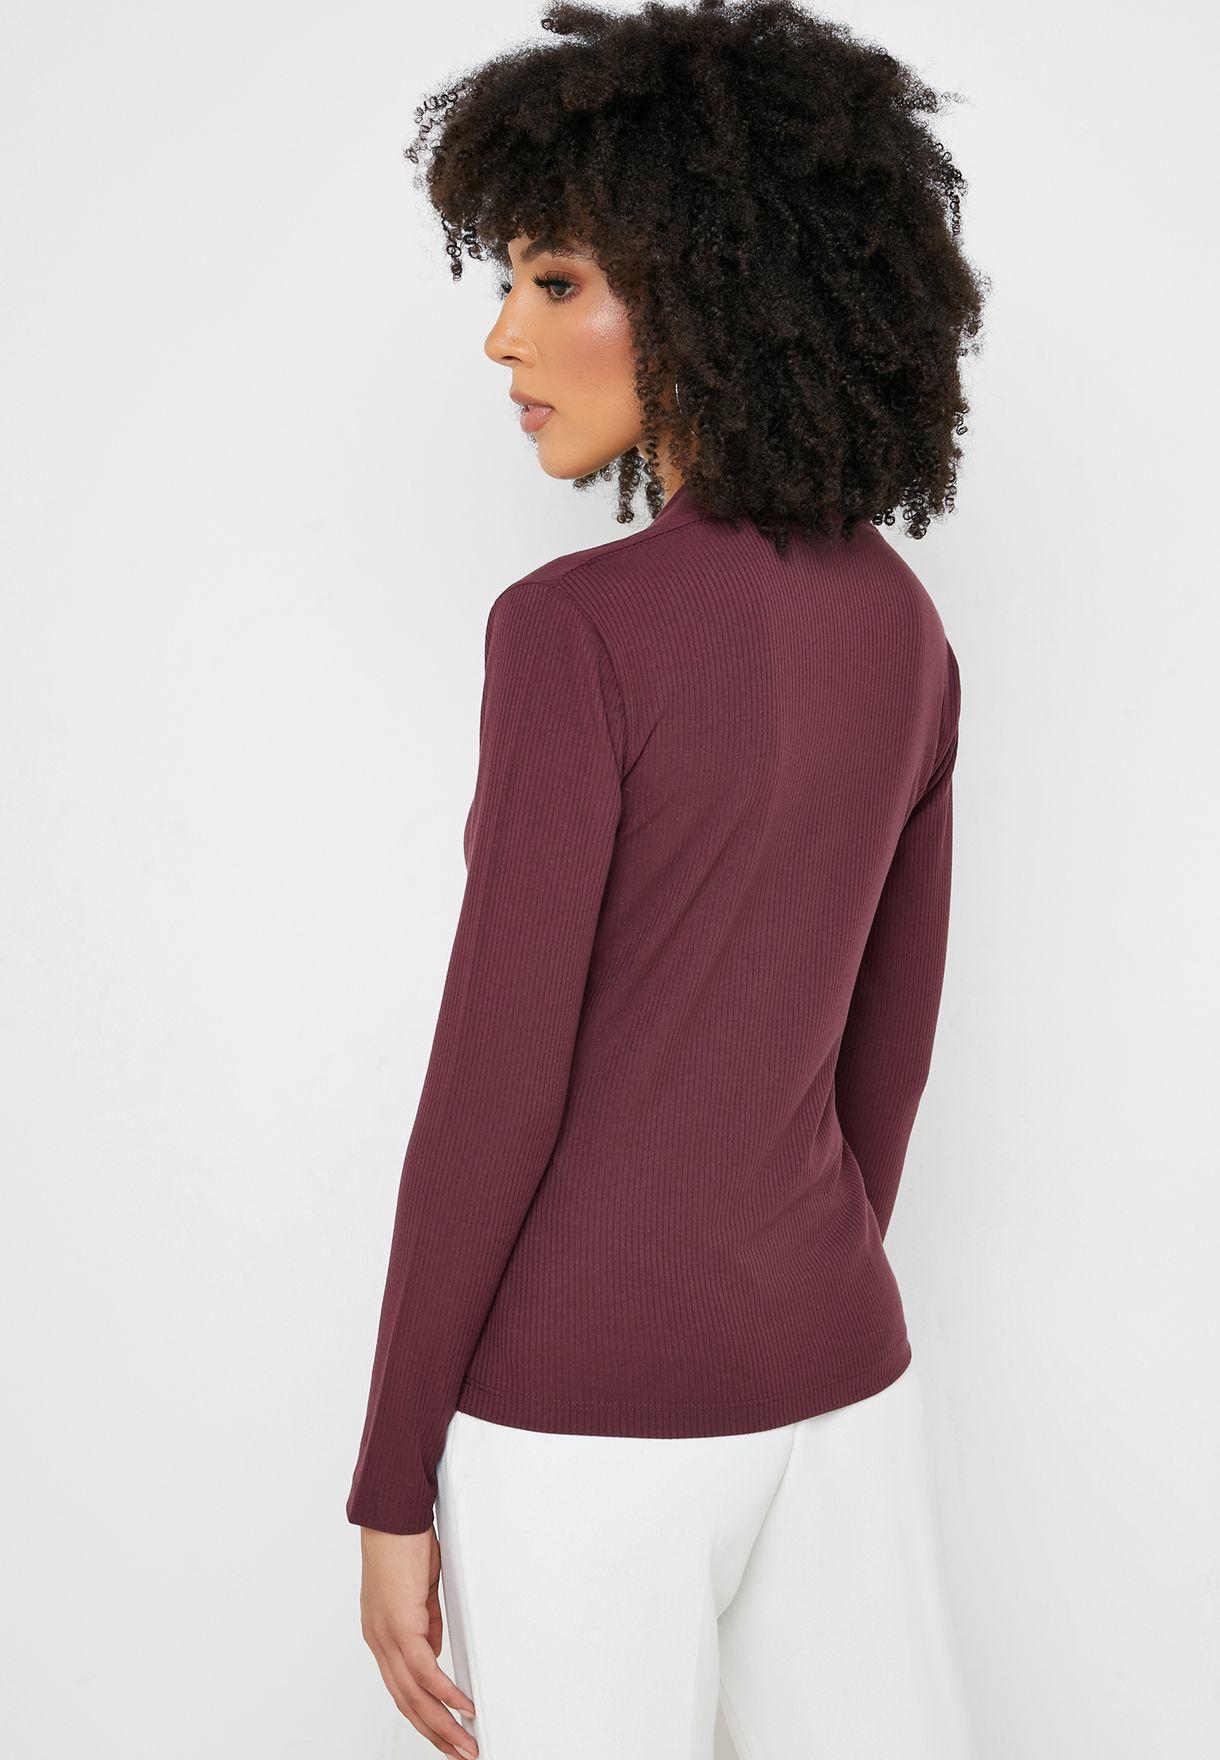 V-Neck Long Sleeve Top